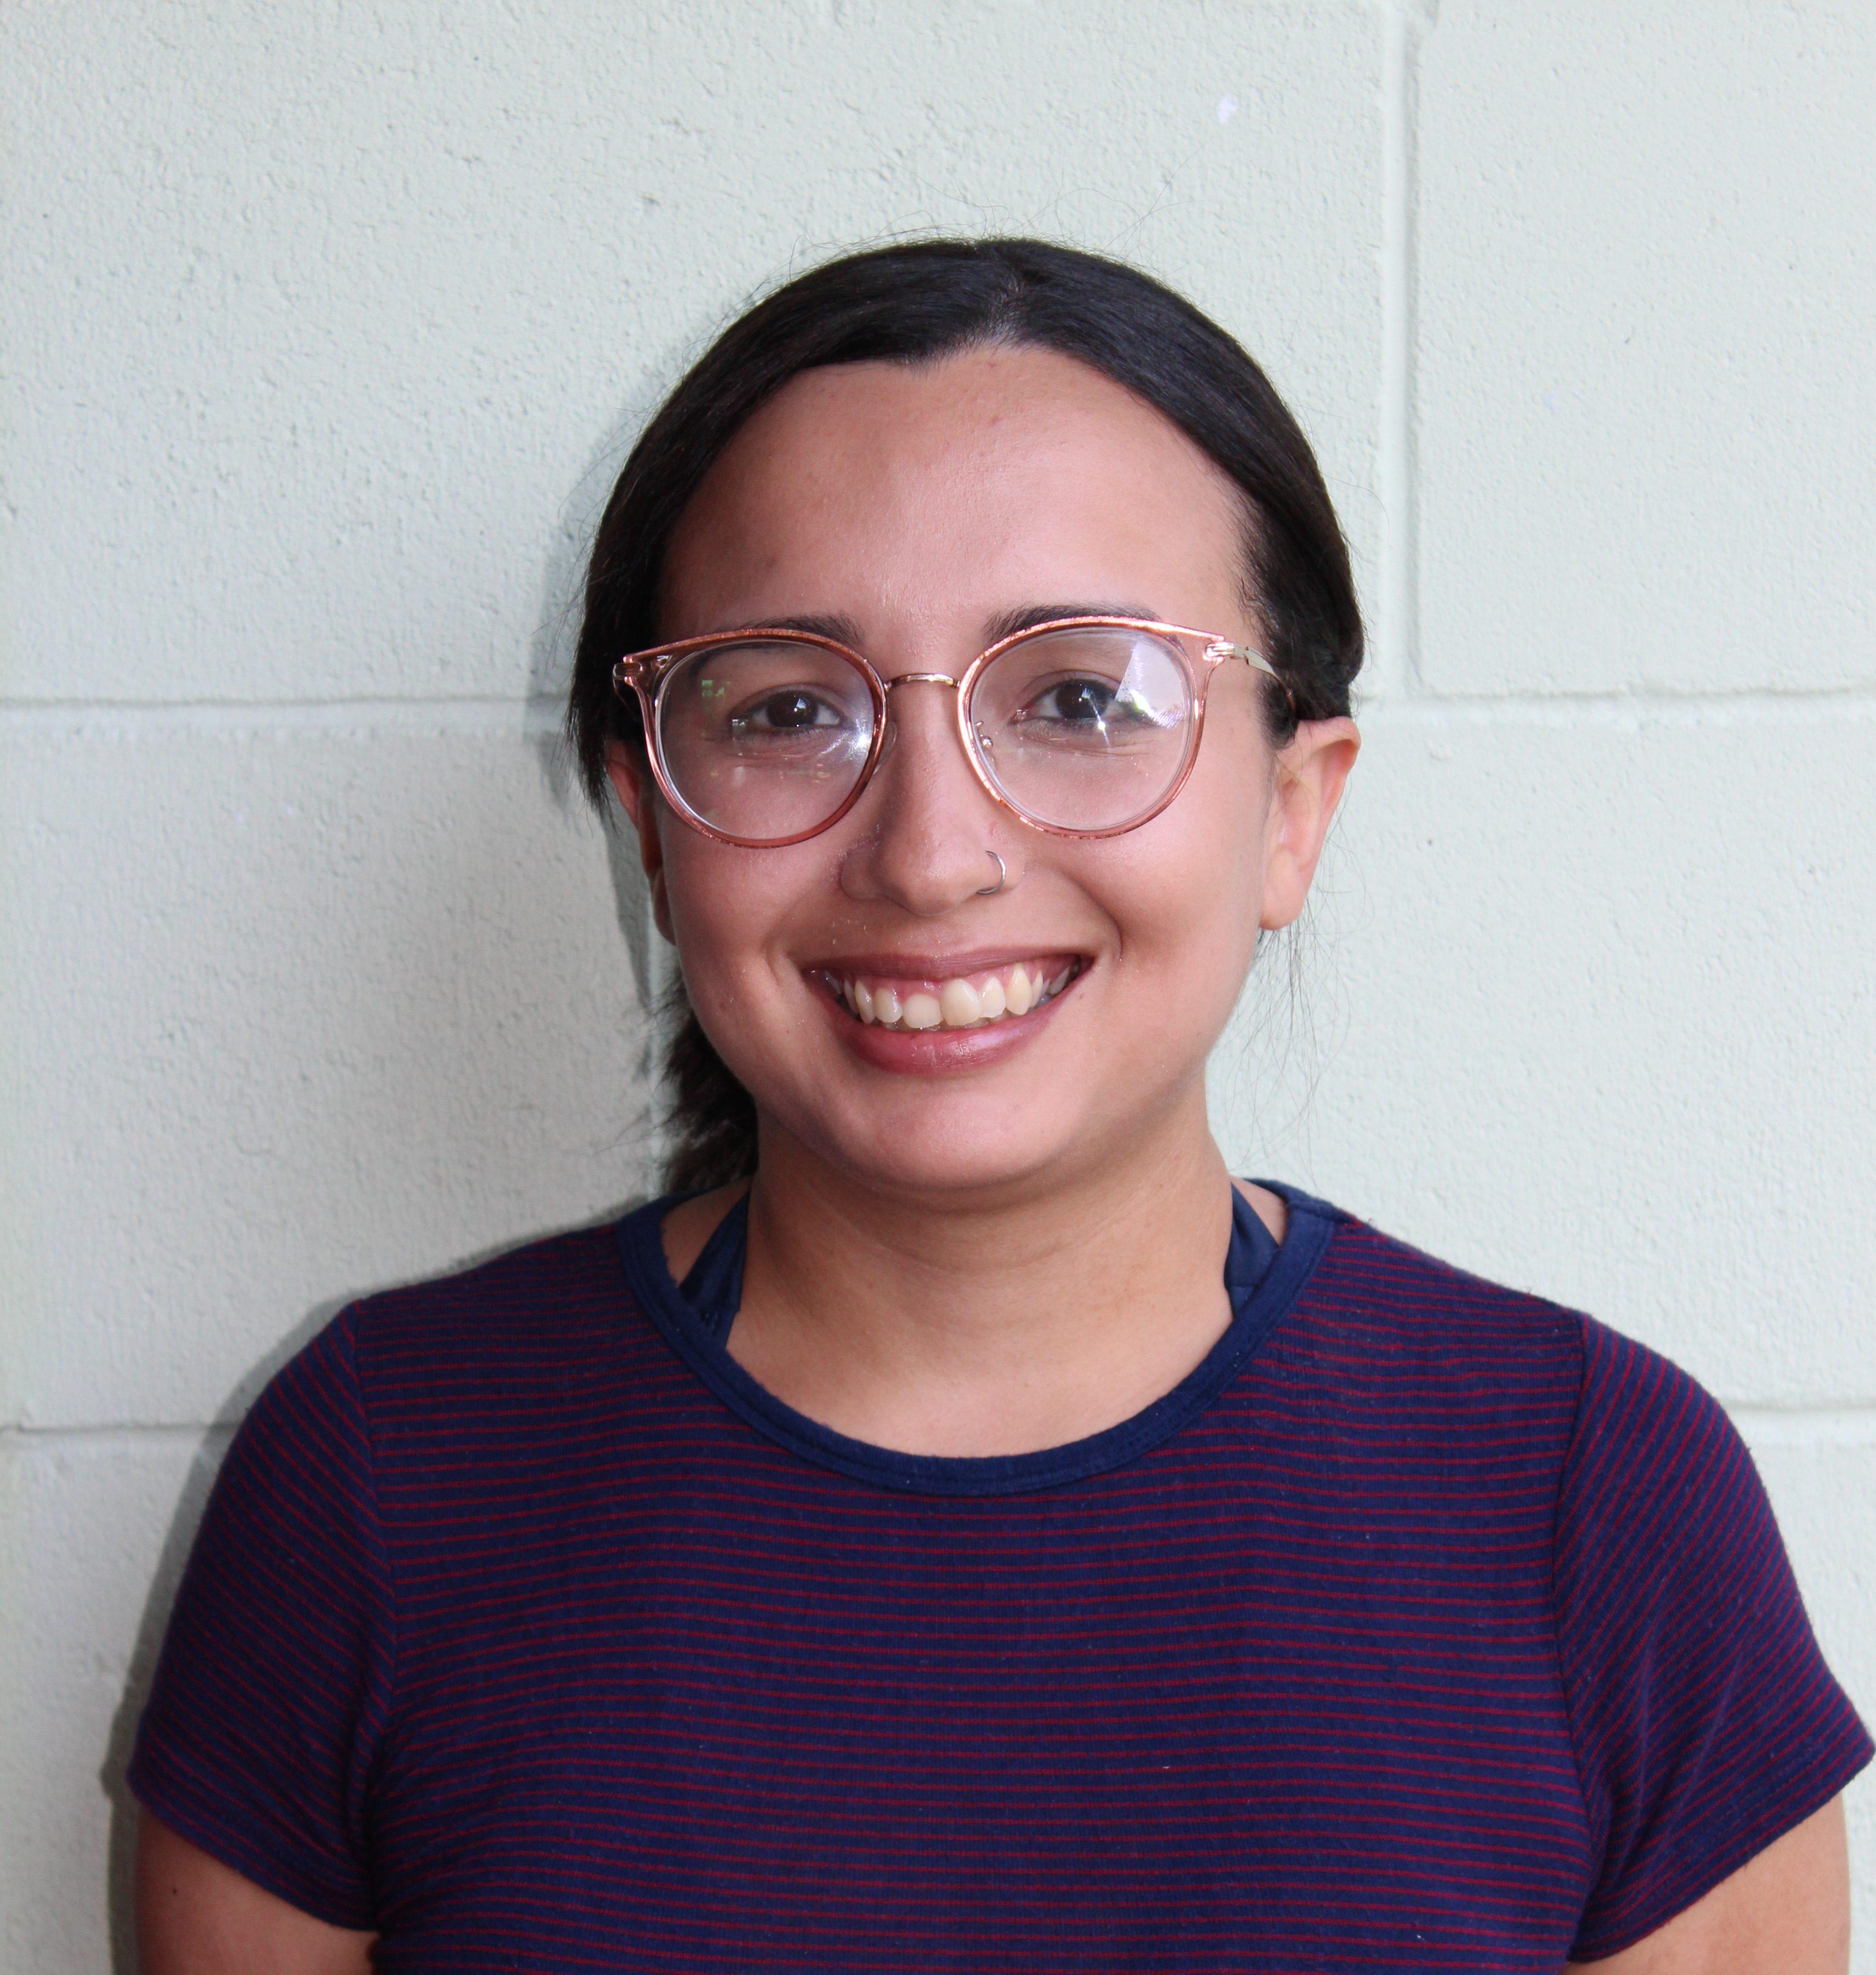 Luisa Arredondo